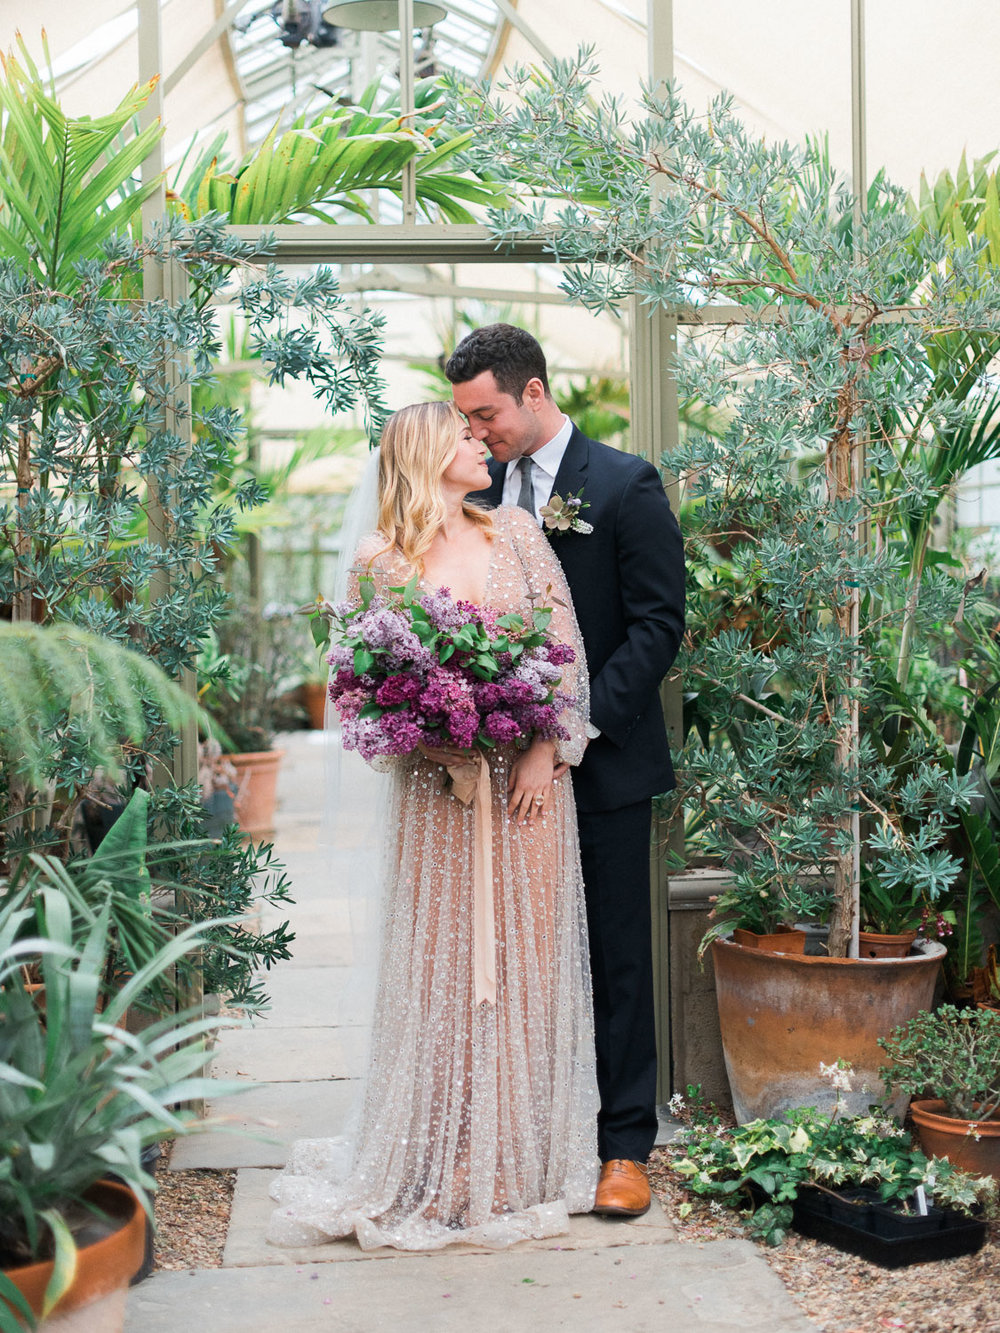 christinadavisphotography+romantic+greenhouse+jardindebuis+styledshoot48.jpg